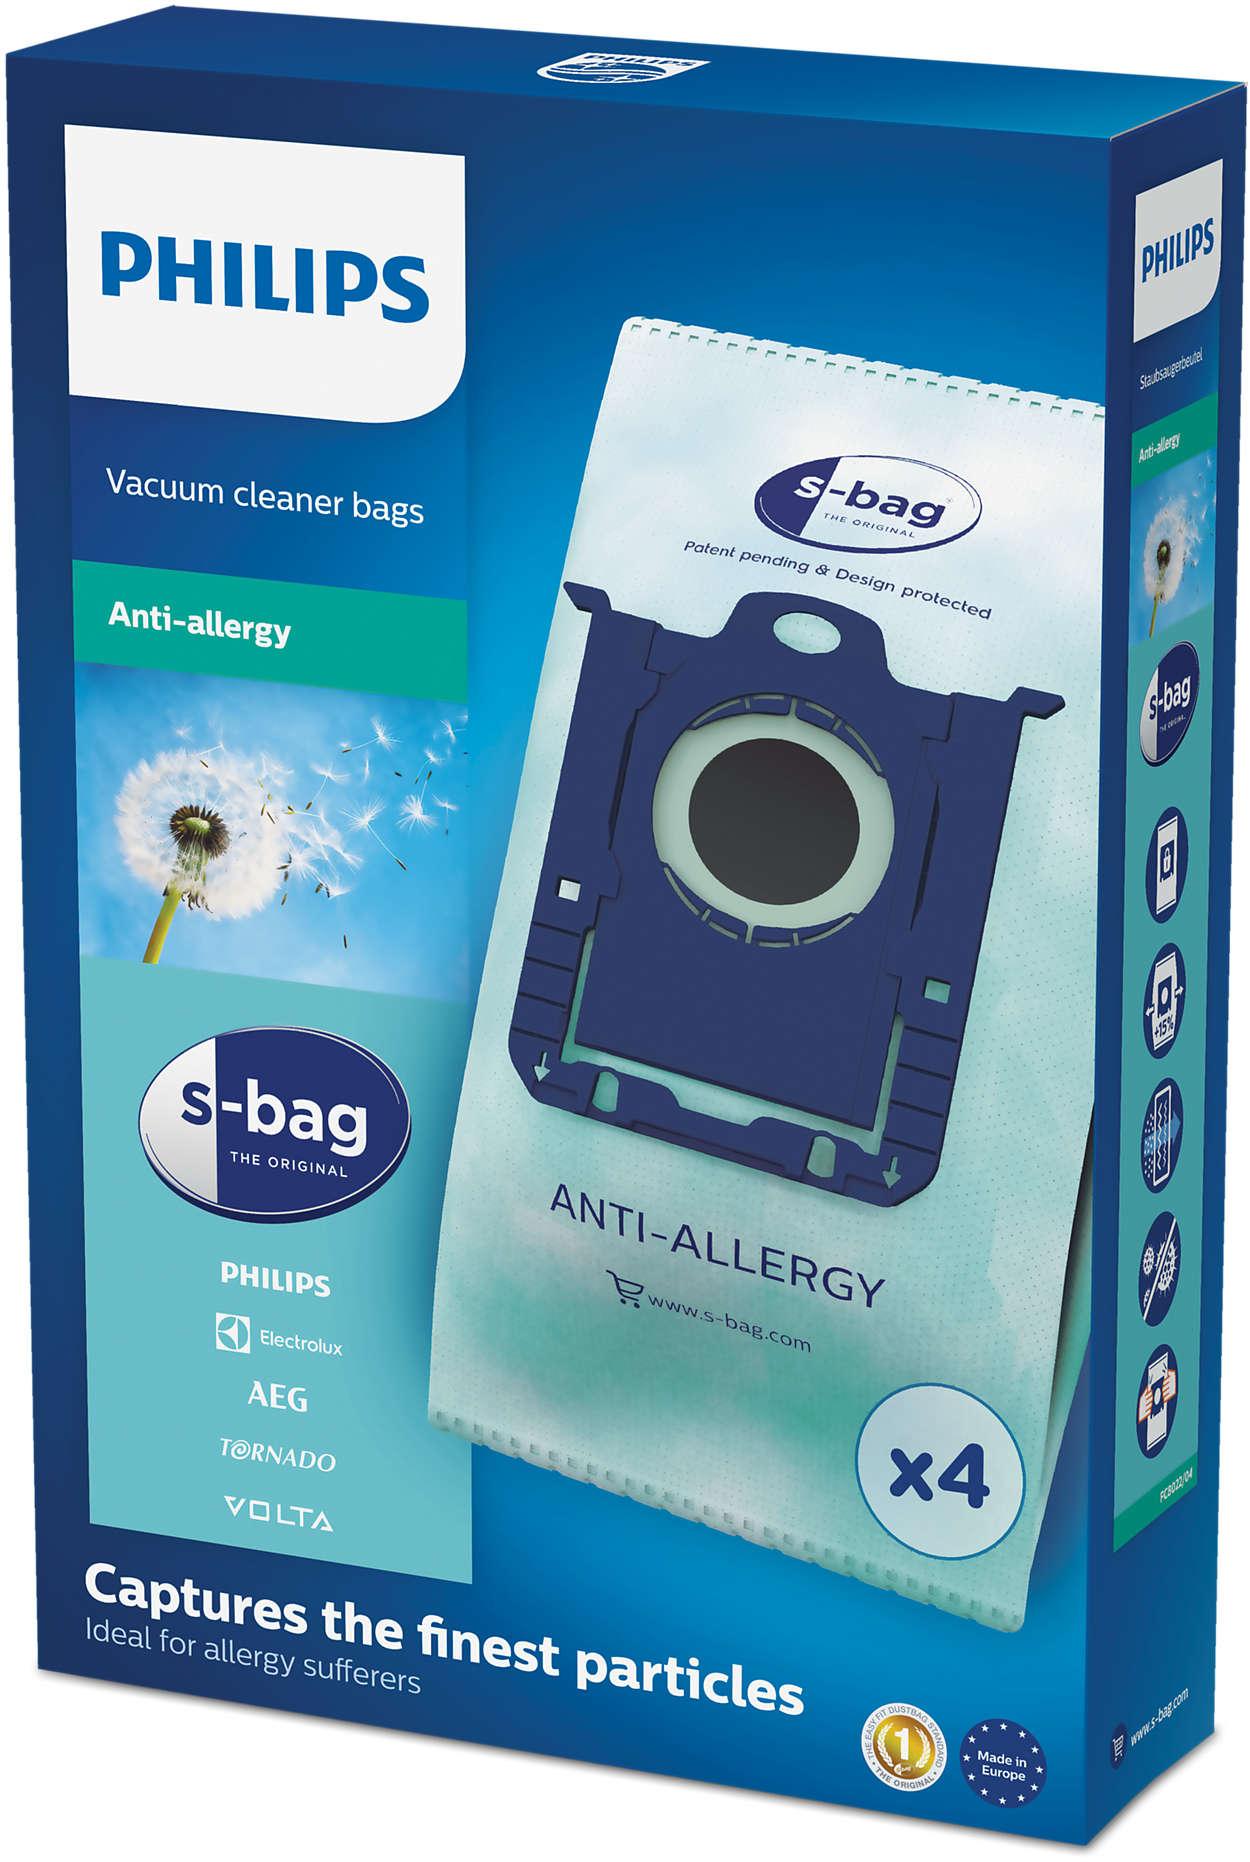 Allergisille sopiva s-bag®-pölypussi